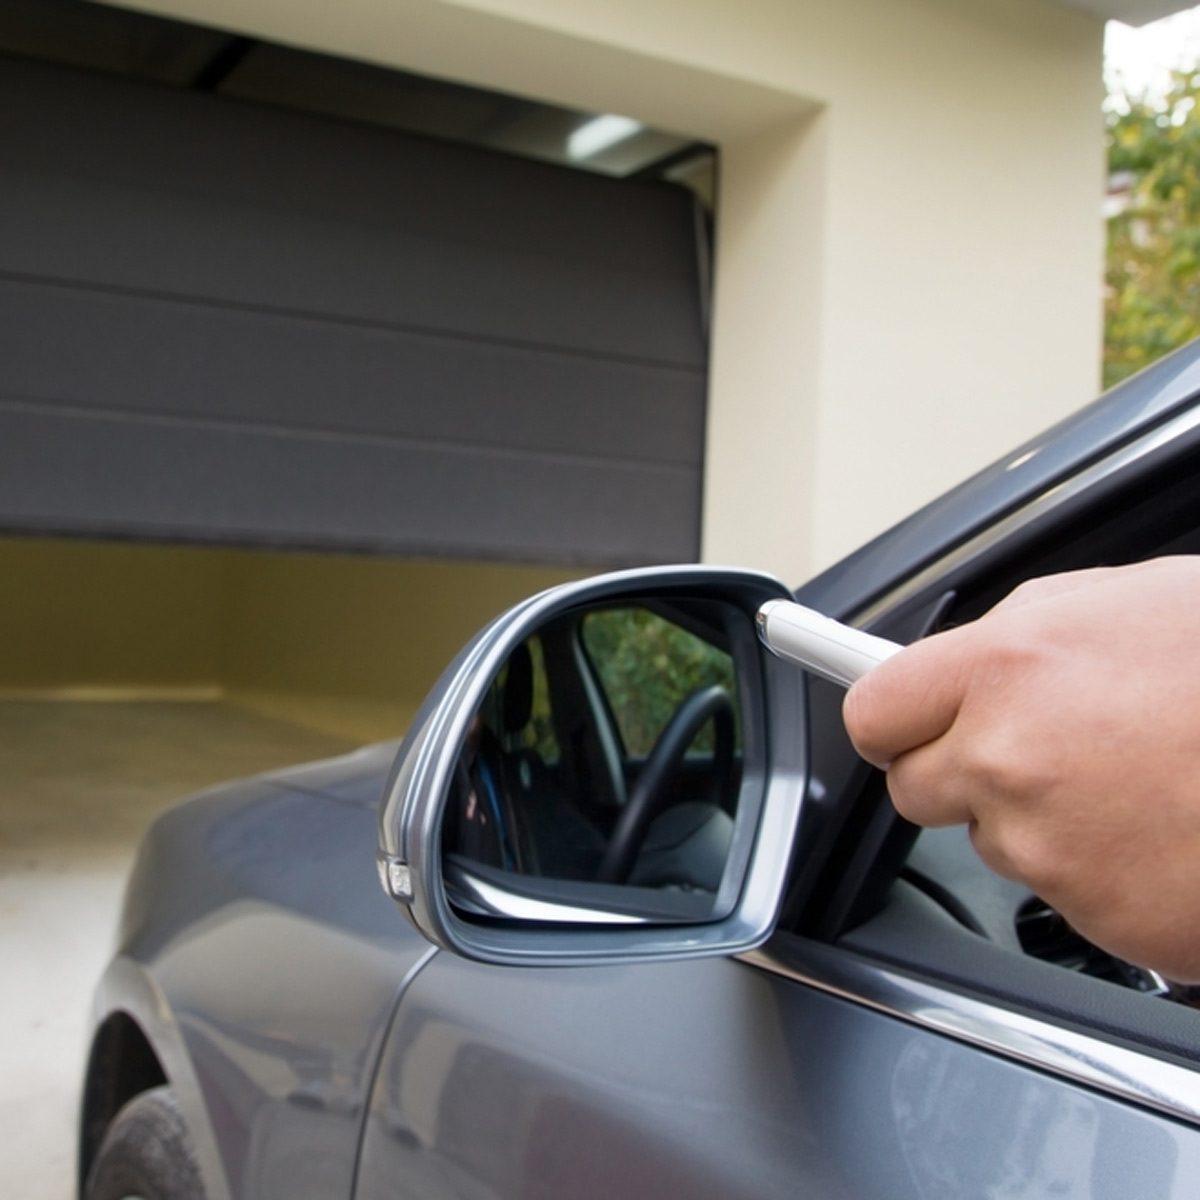 dfh3_shutterstock_233751859 smart garage opener car